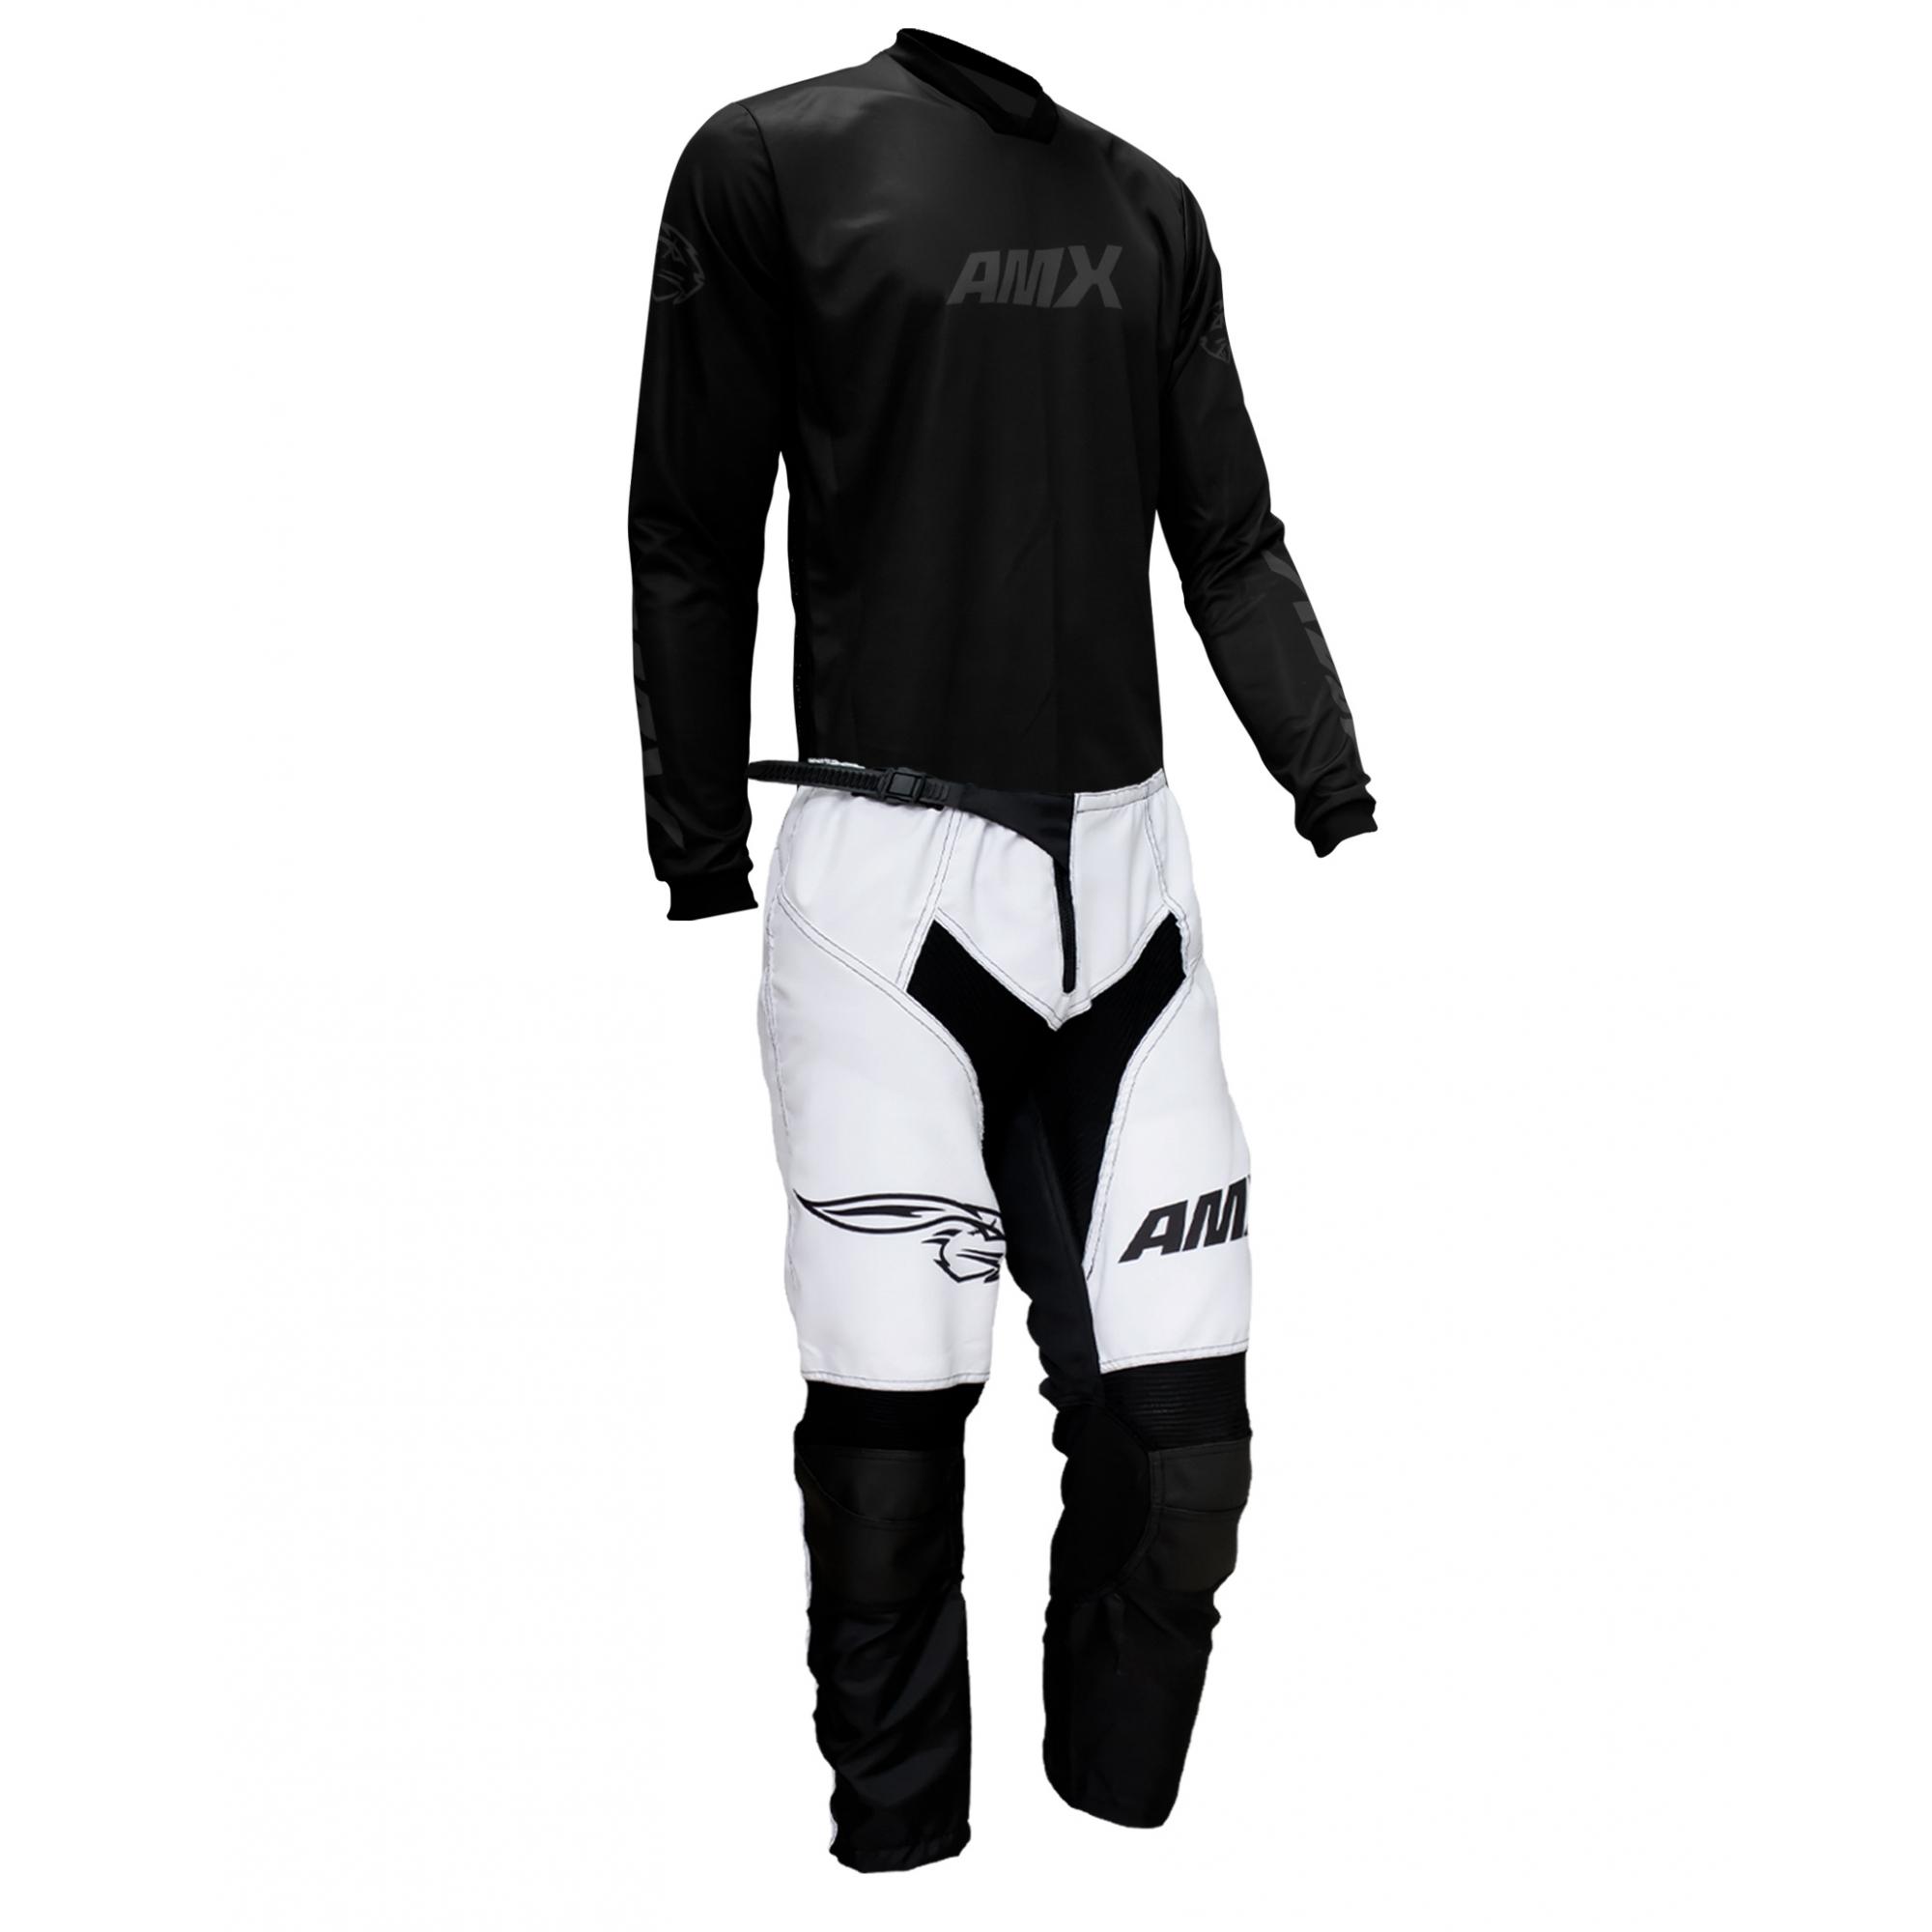 Conjunto Roupa Amx Cross One Preto Branco Calça Camisa Trilha Motocross